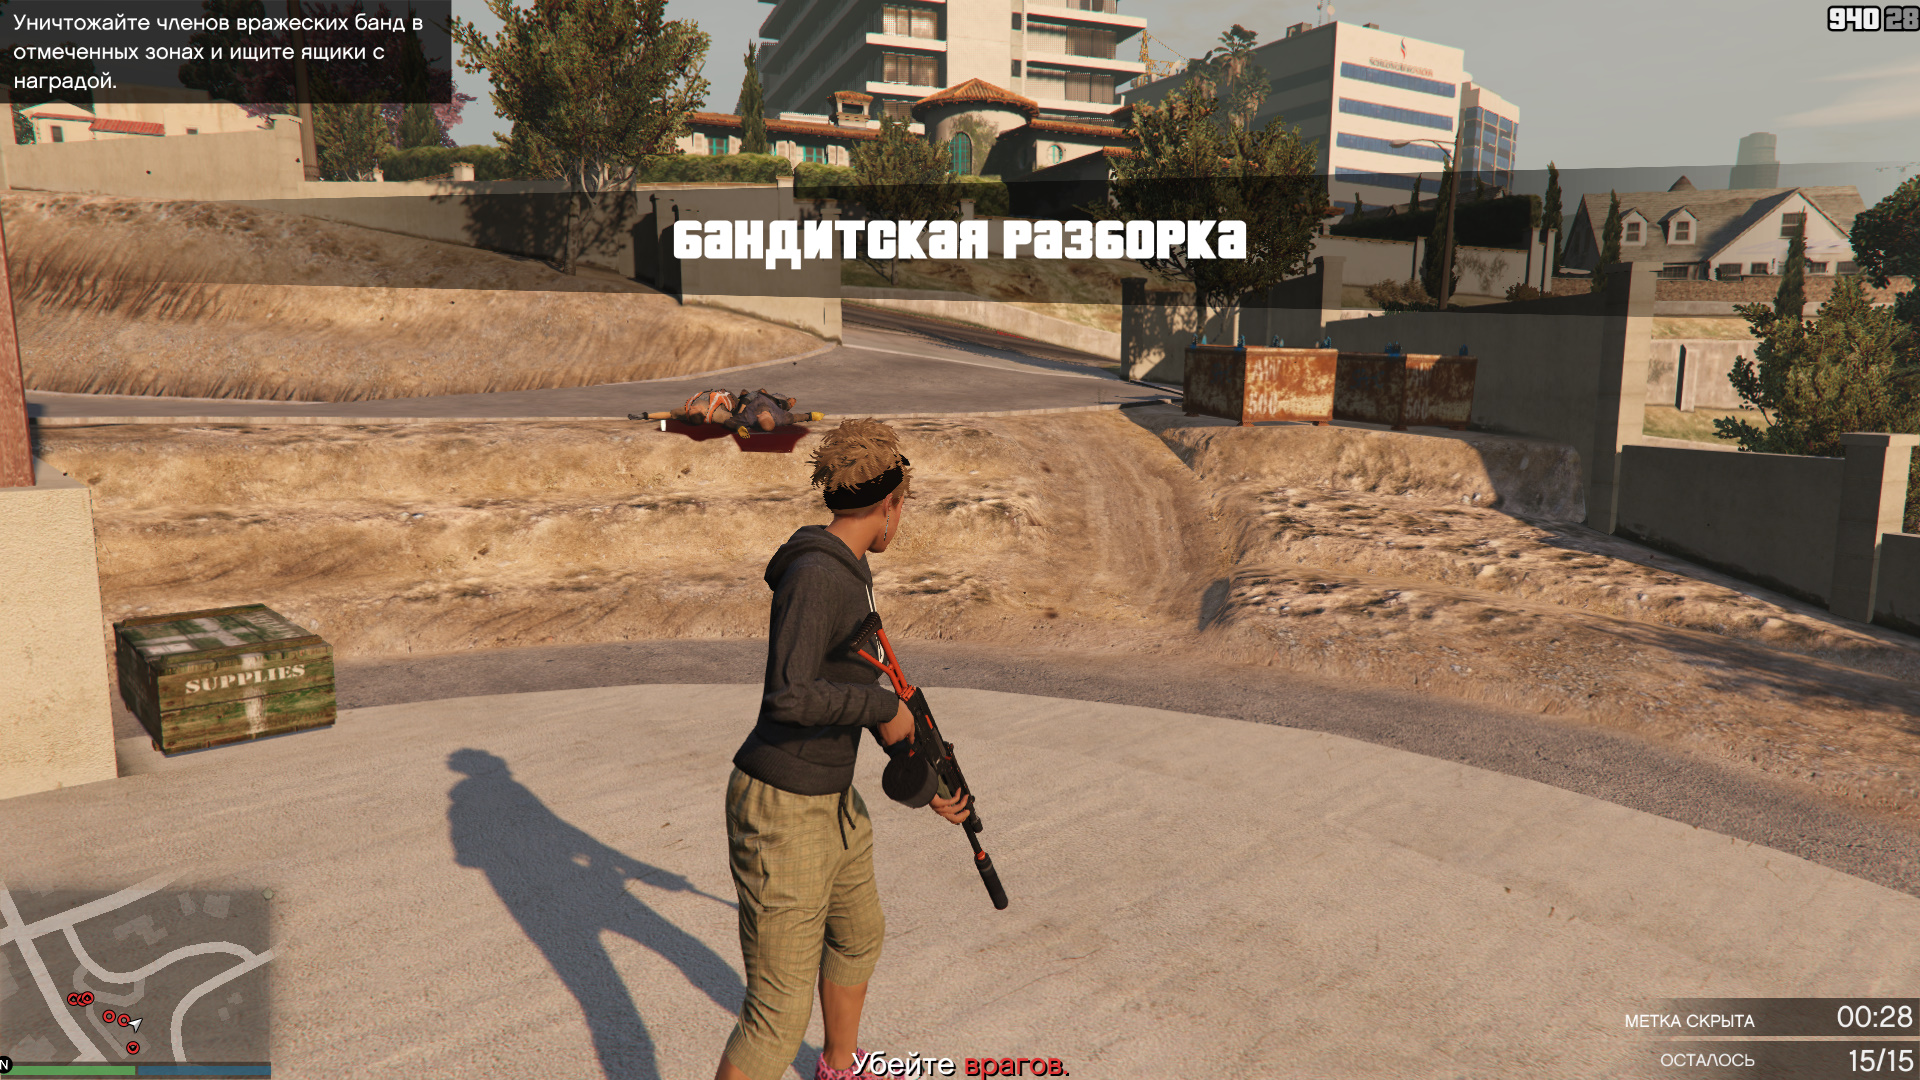 GTA5 2017-04-28 18-48-19-223.jpg - Grand Theft Auto 5